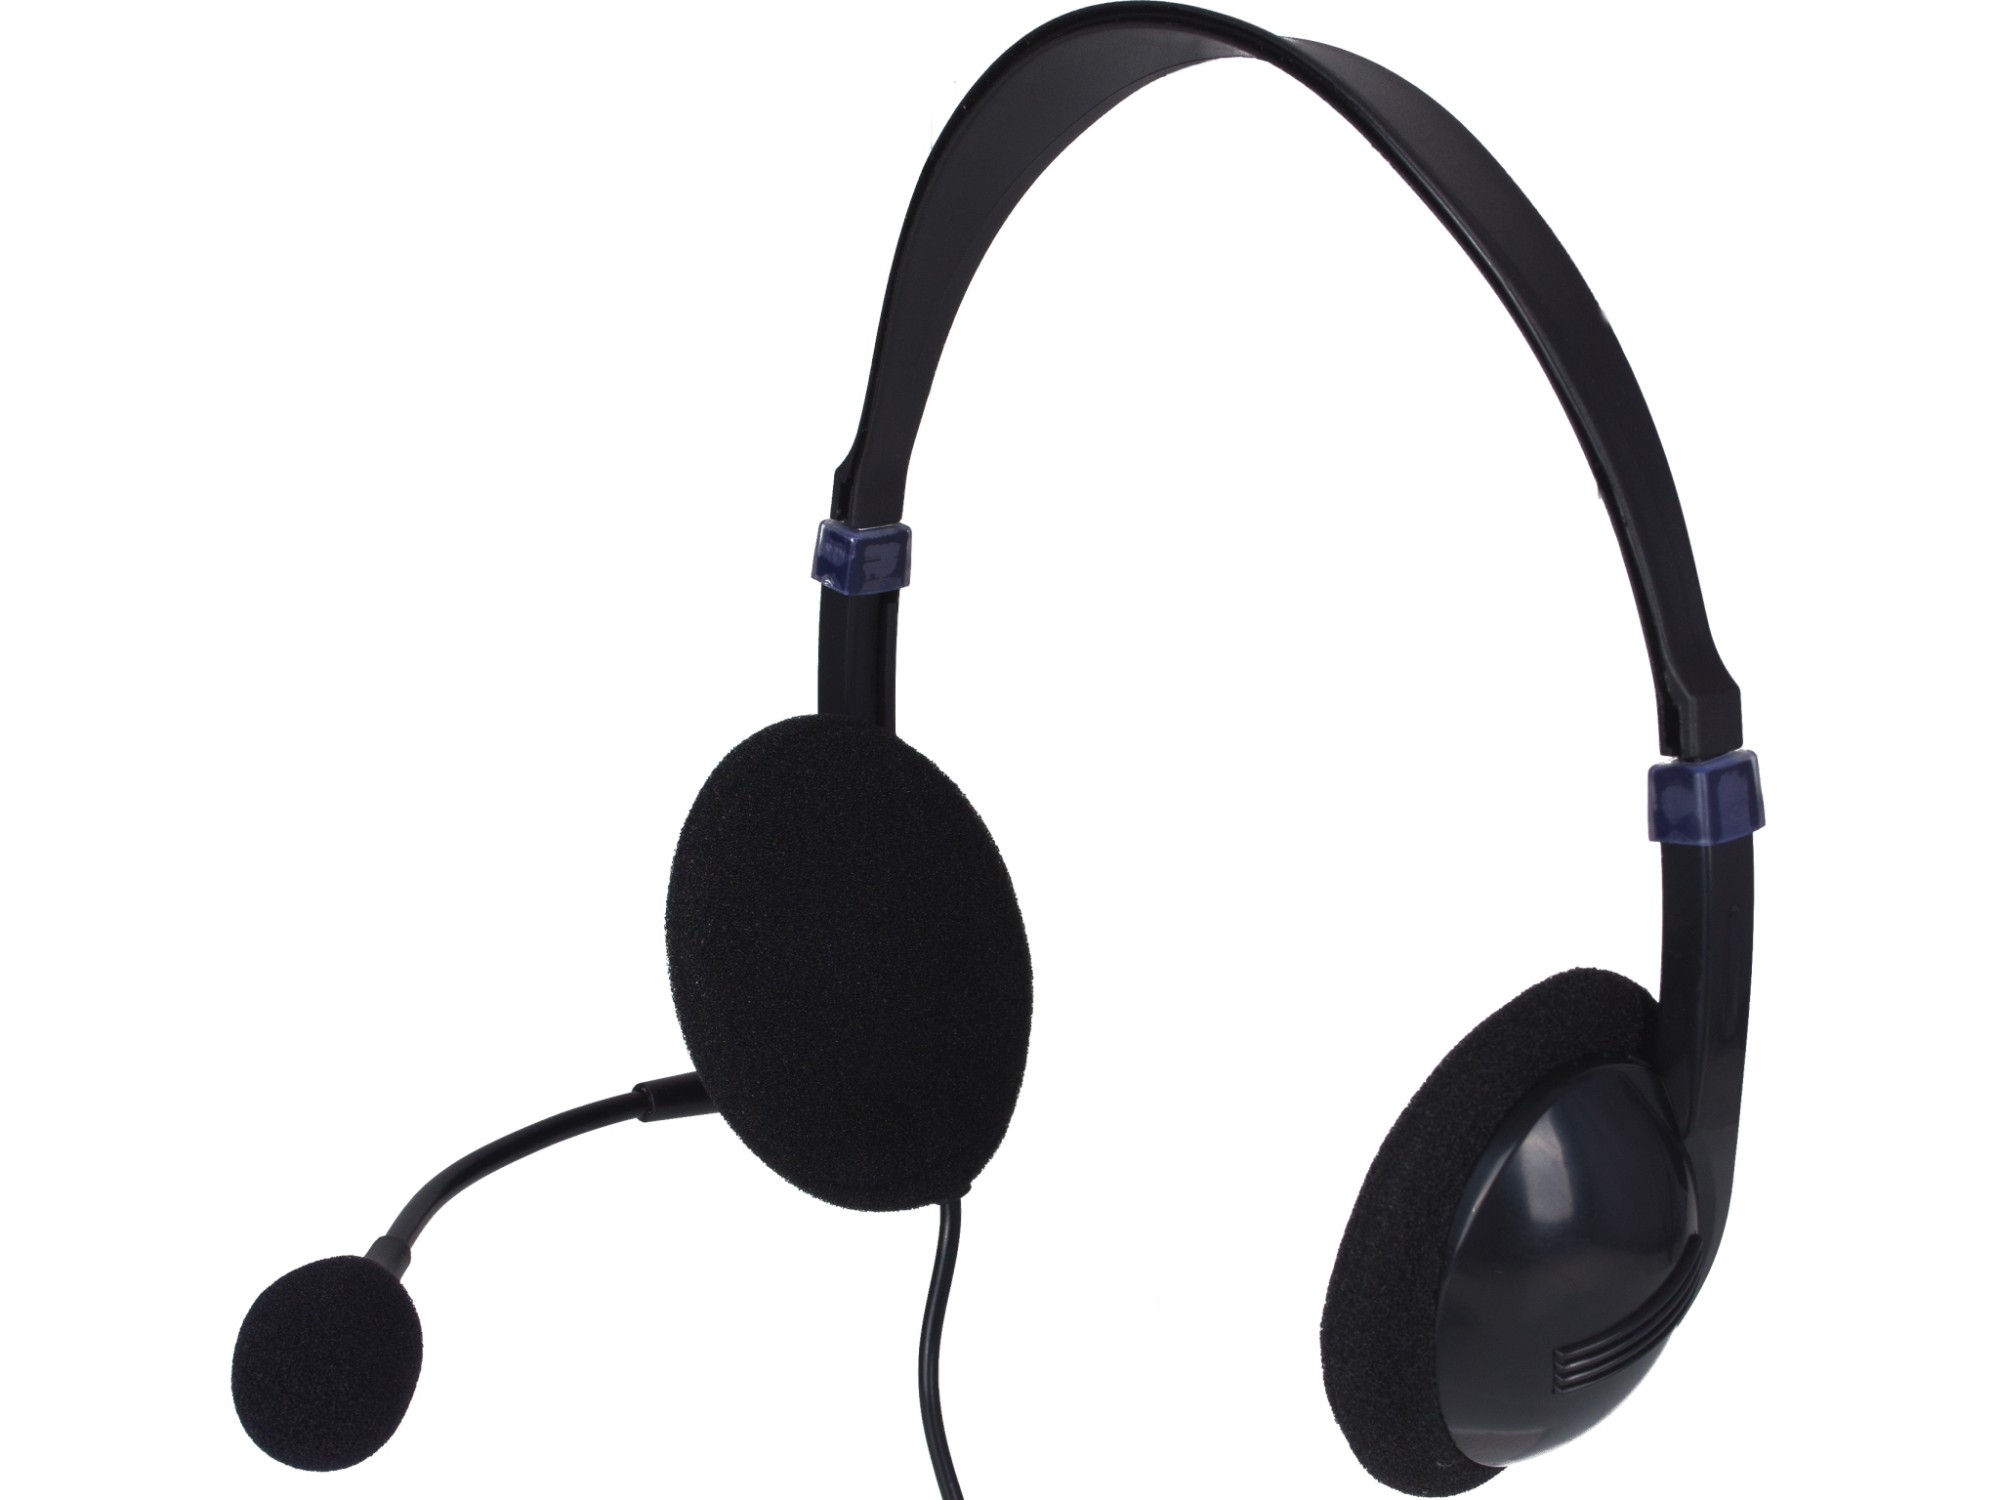 Sandberg Saver USB headset